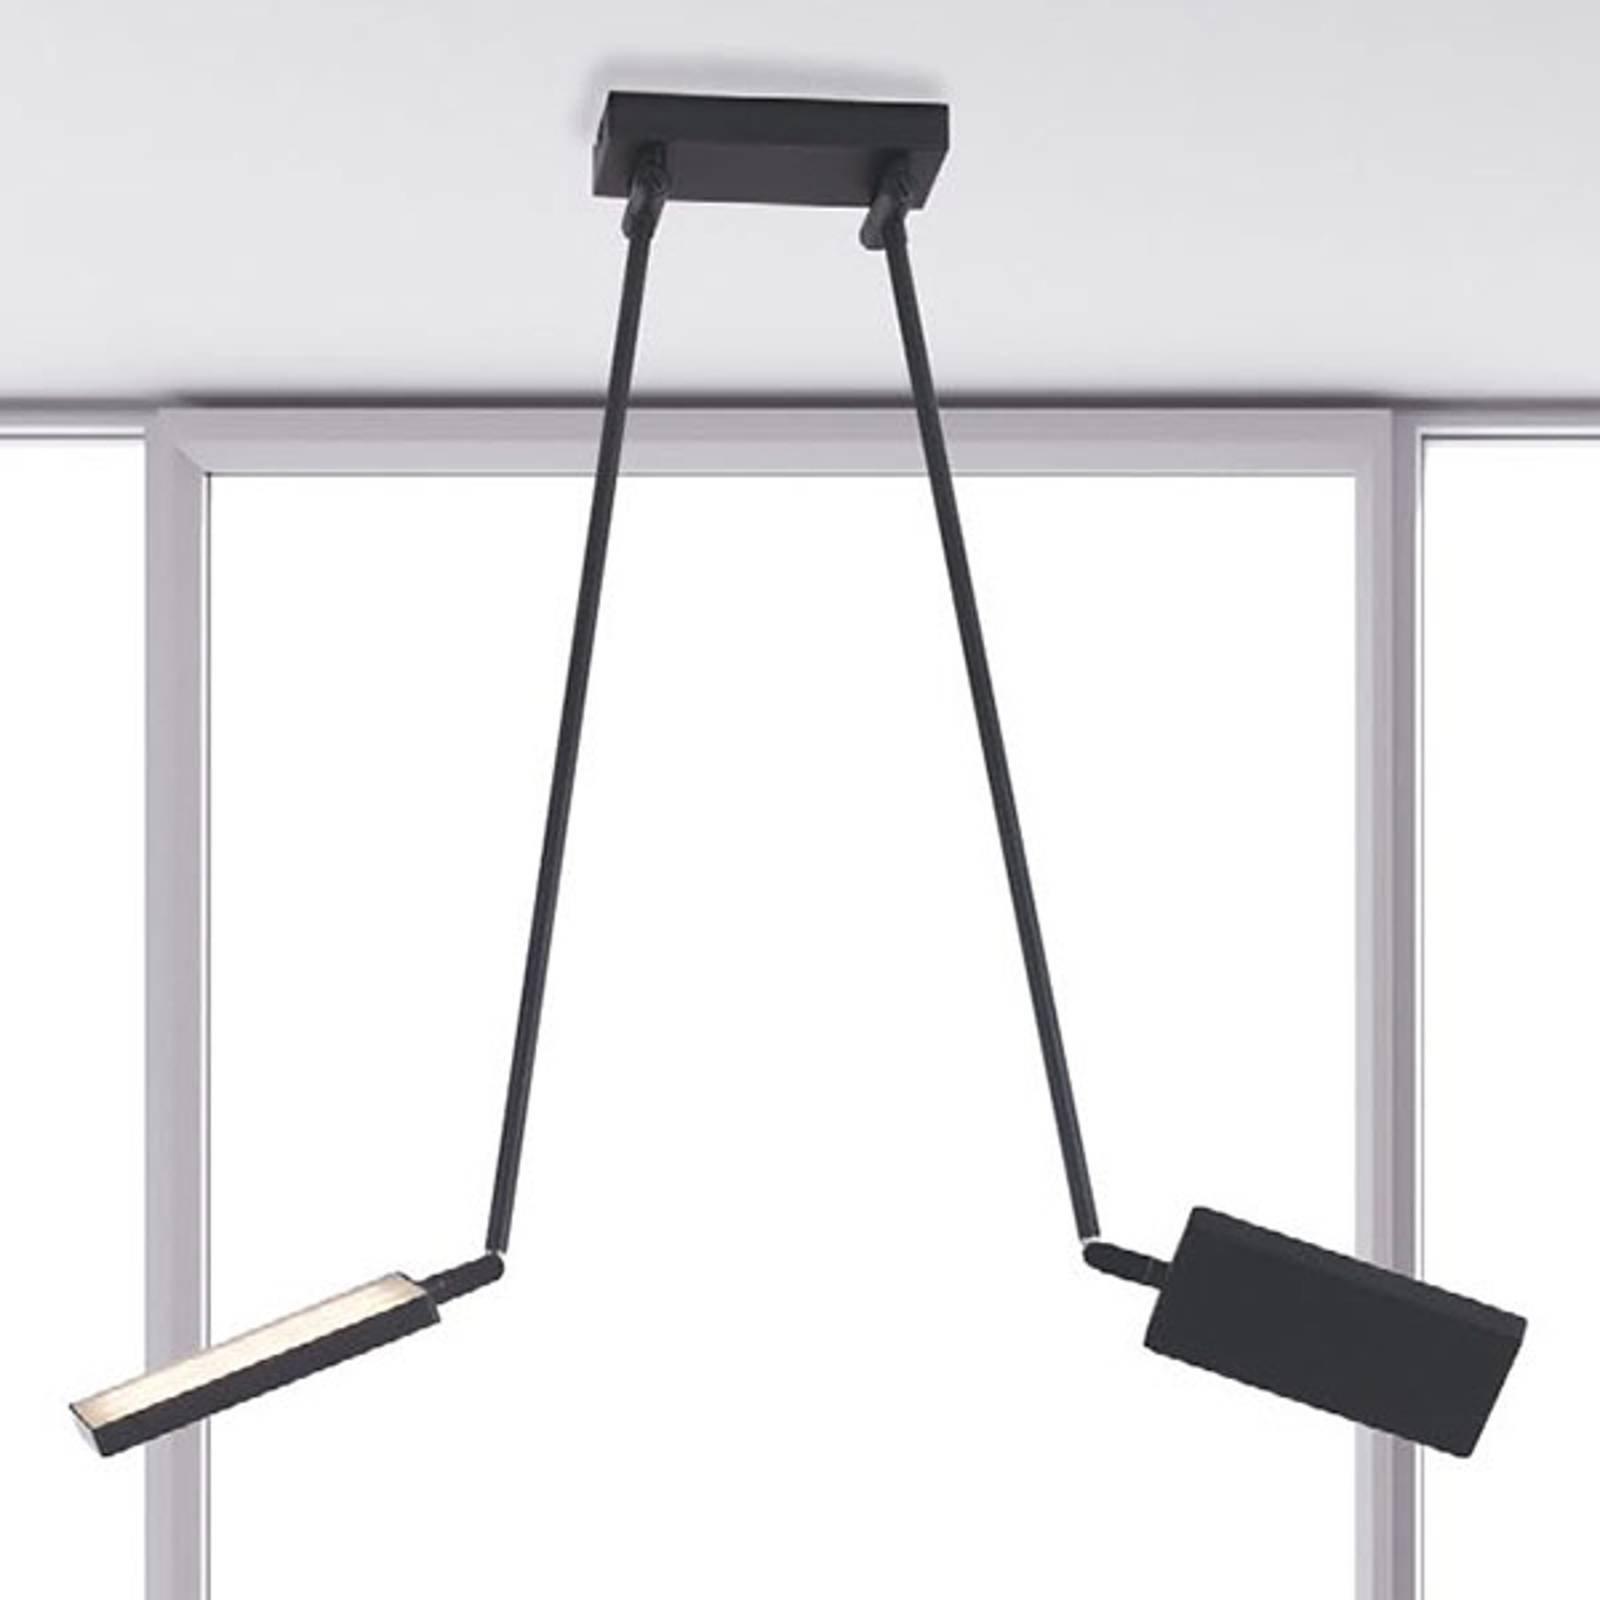 LED-taklampe Book, svart